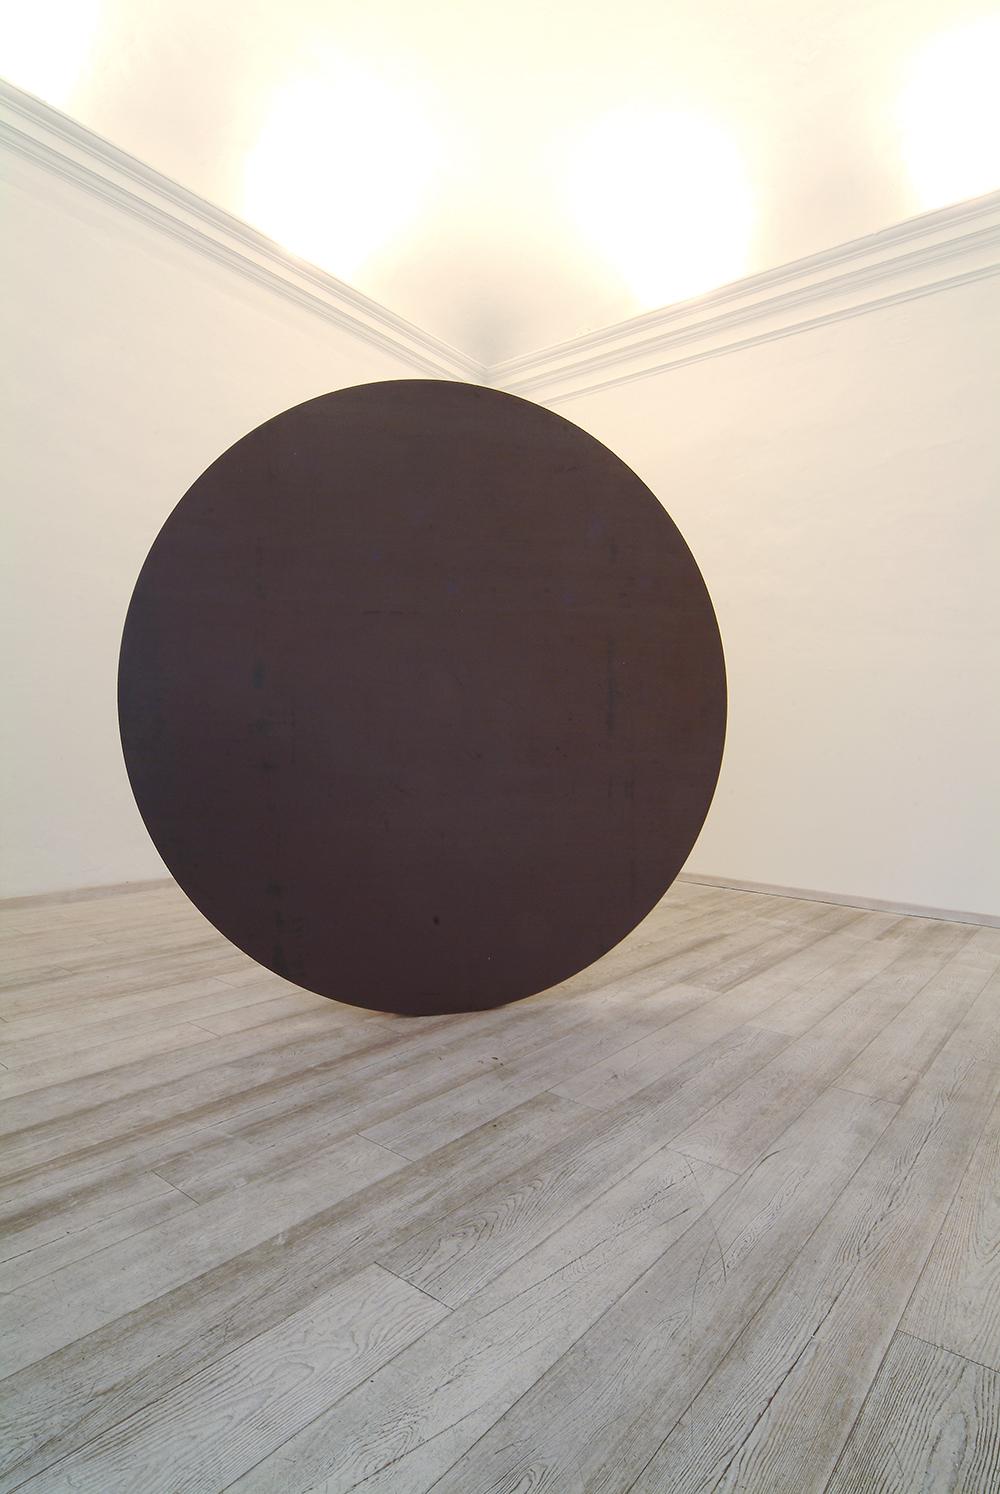 Disco in equilibrio, 2005 - sala I, ferro e magnete, Ø cm 225